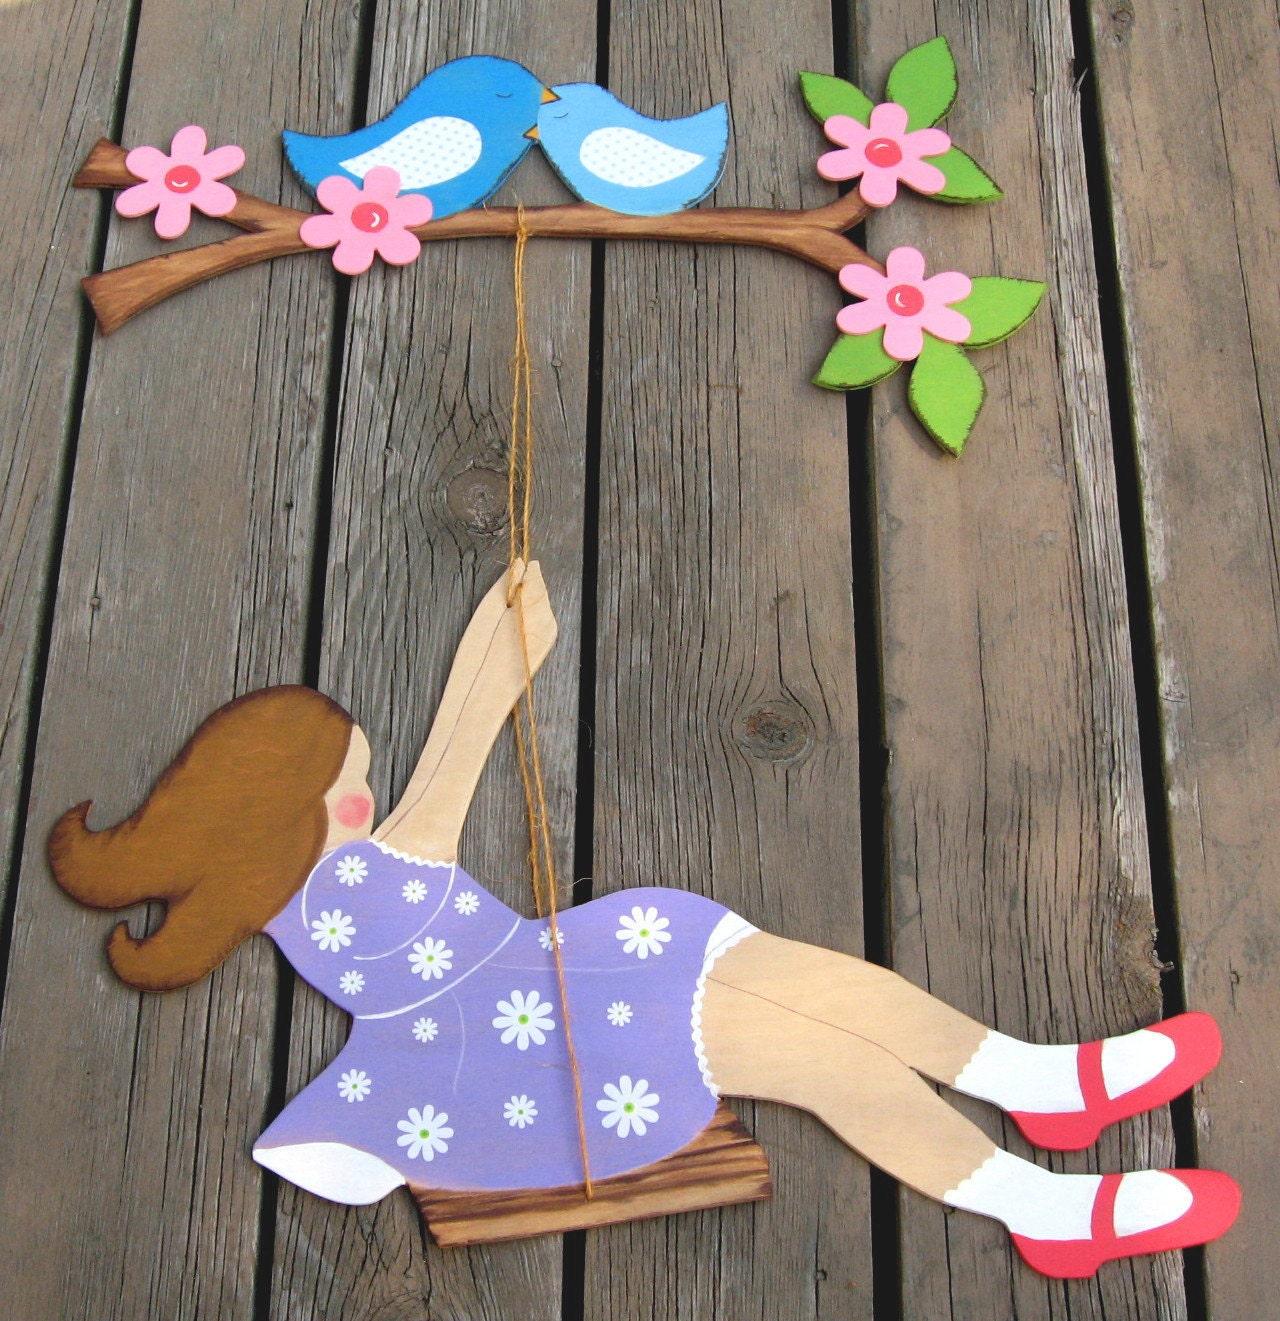 Древесина стен Mural Девушка Размахивая Bluebird Cherry Blossom ветвь дерева экологию по Storytime АРТ